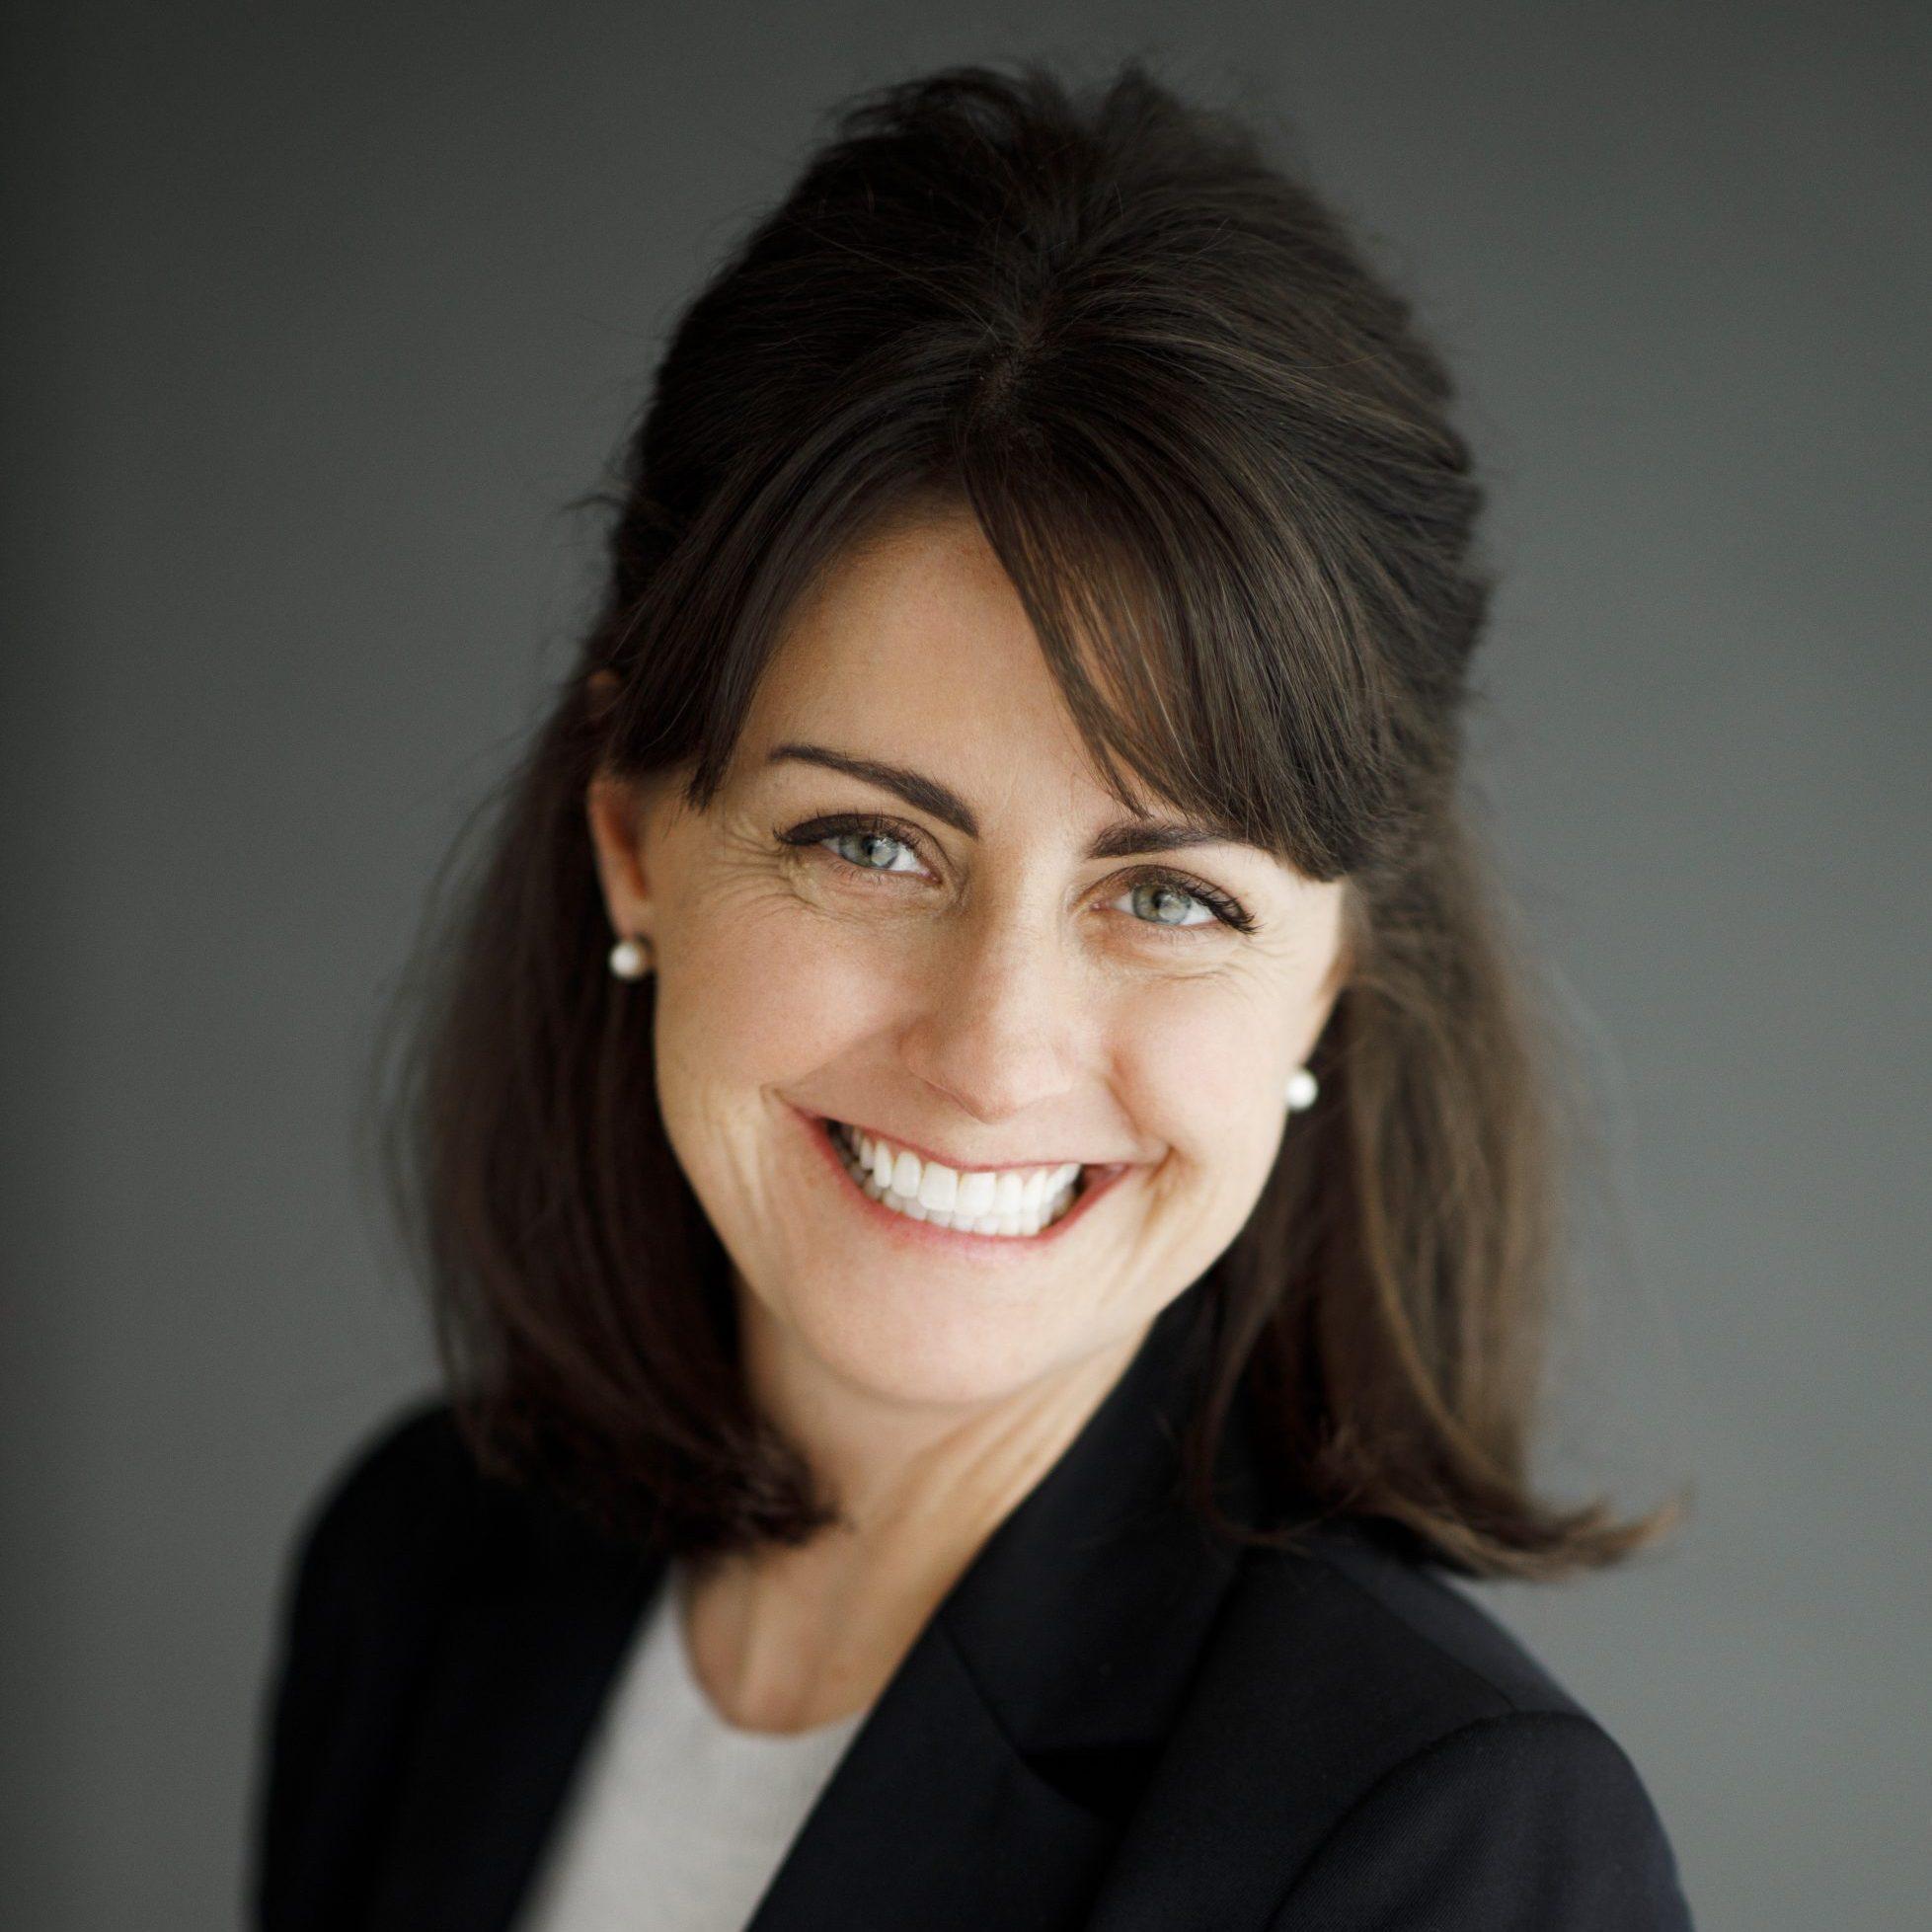 portrait of amy in a black blazer with a grey background